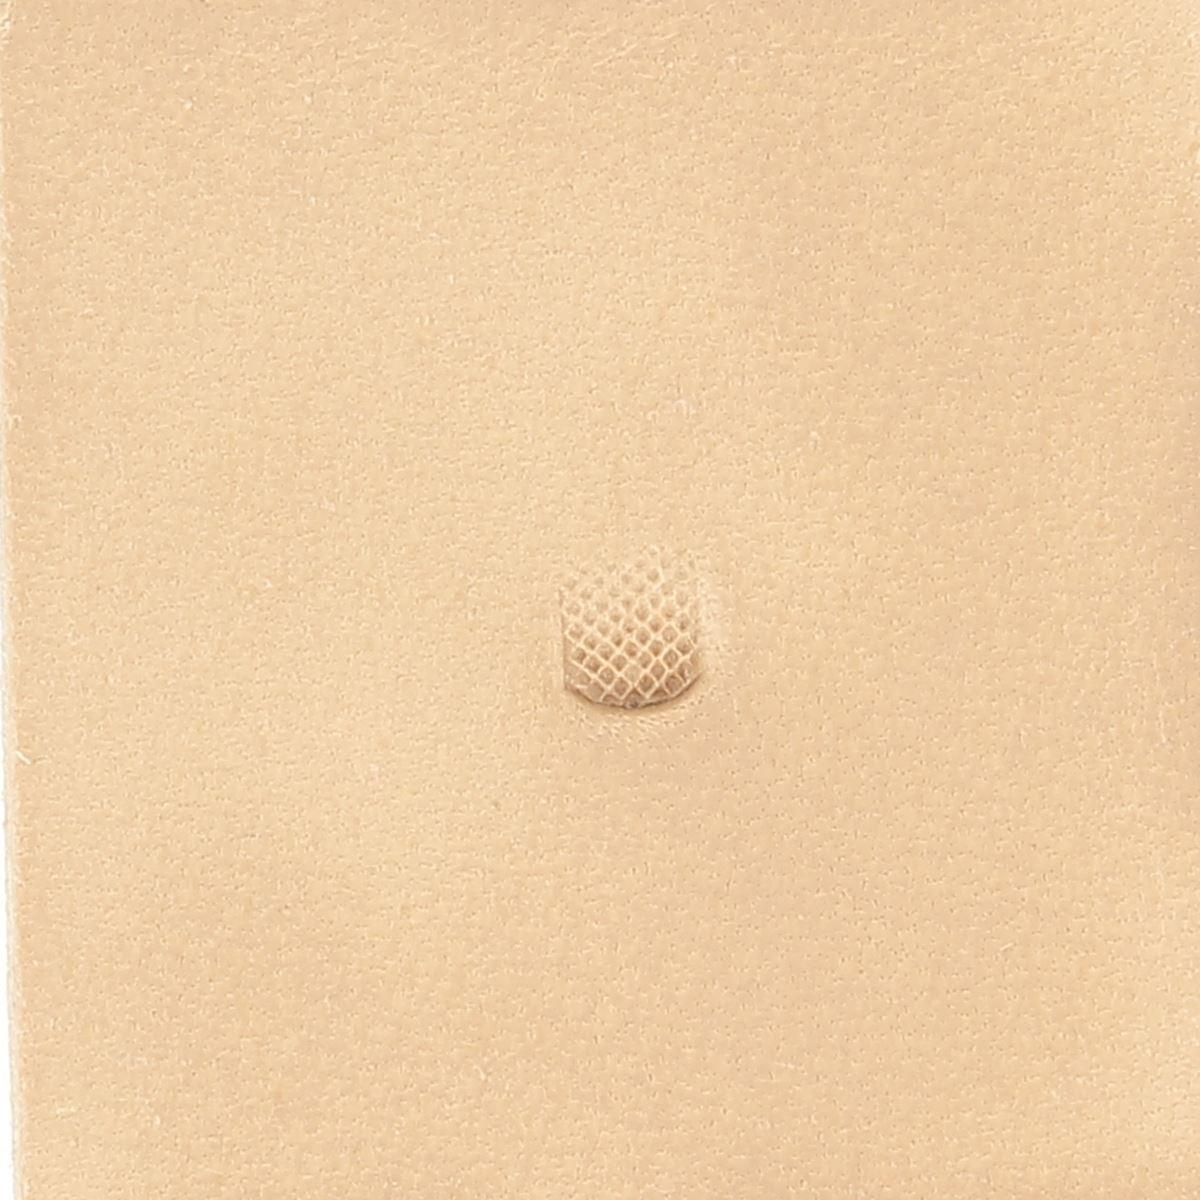 Matoir sur manche - Beveler gros quadrillage 4,8 mm - 6801 - B801